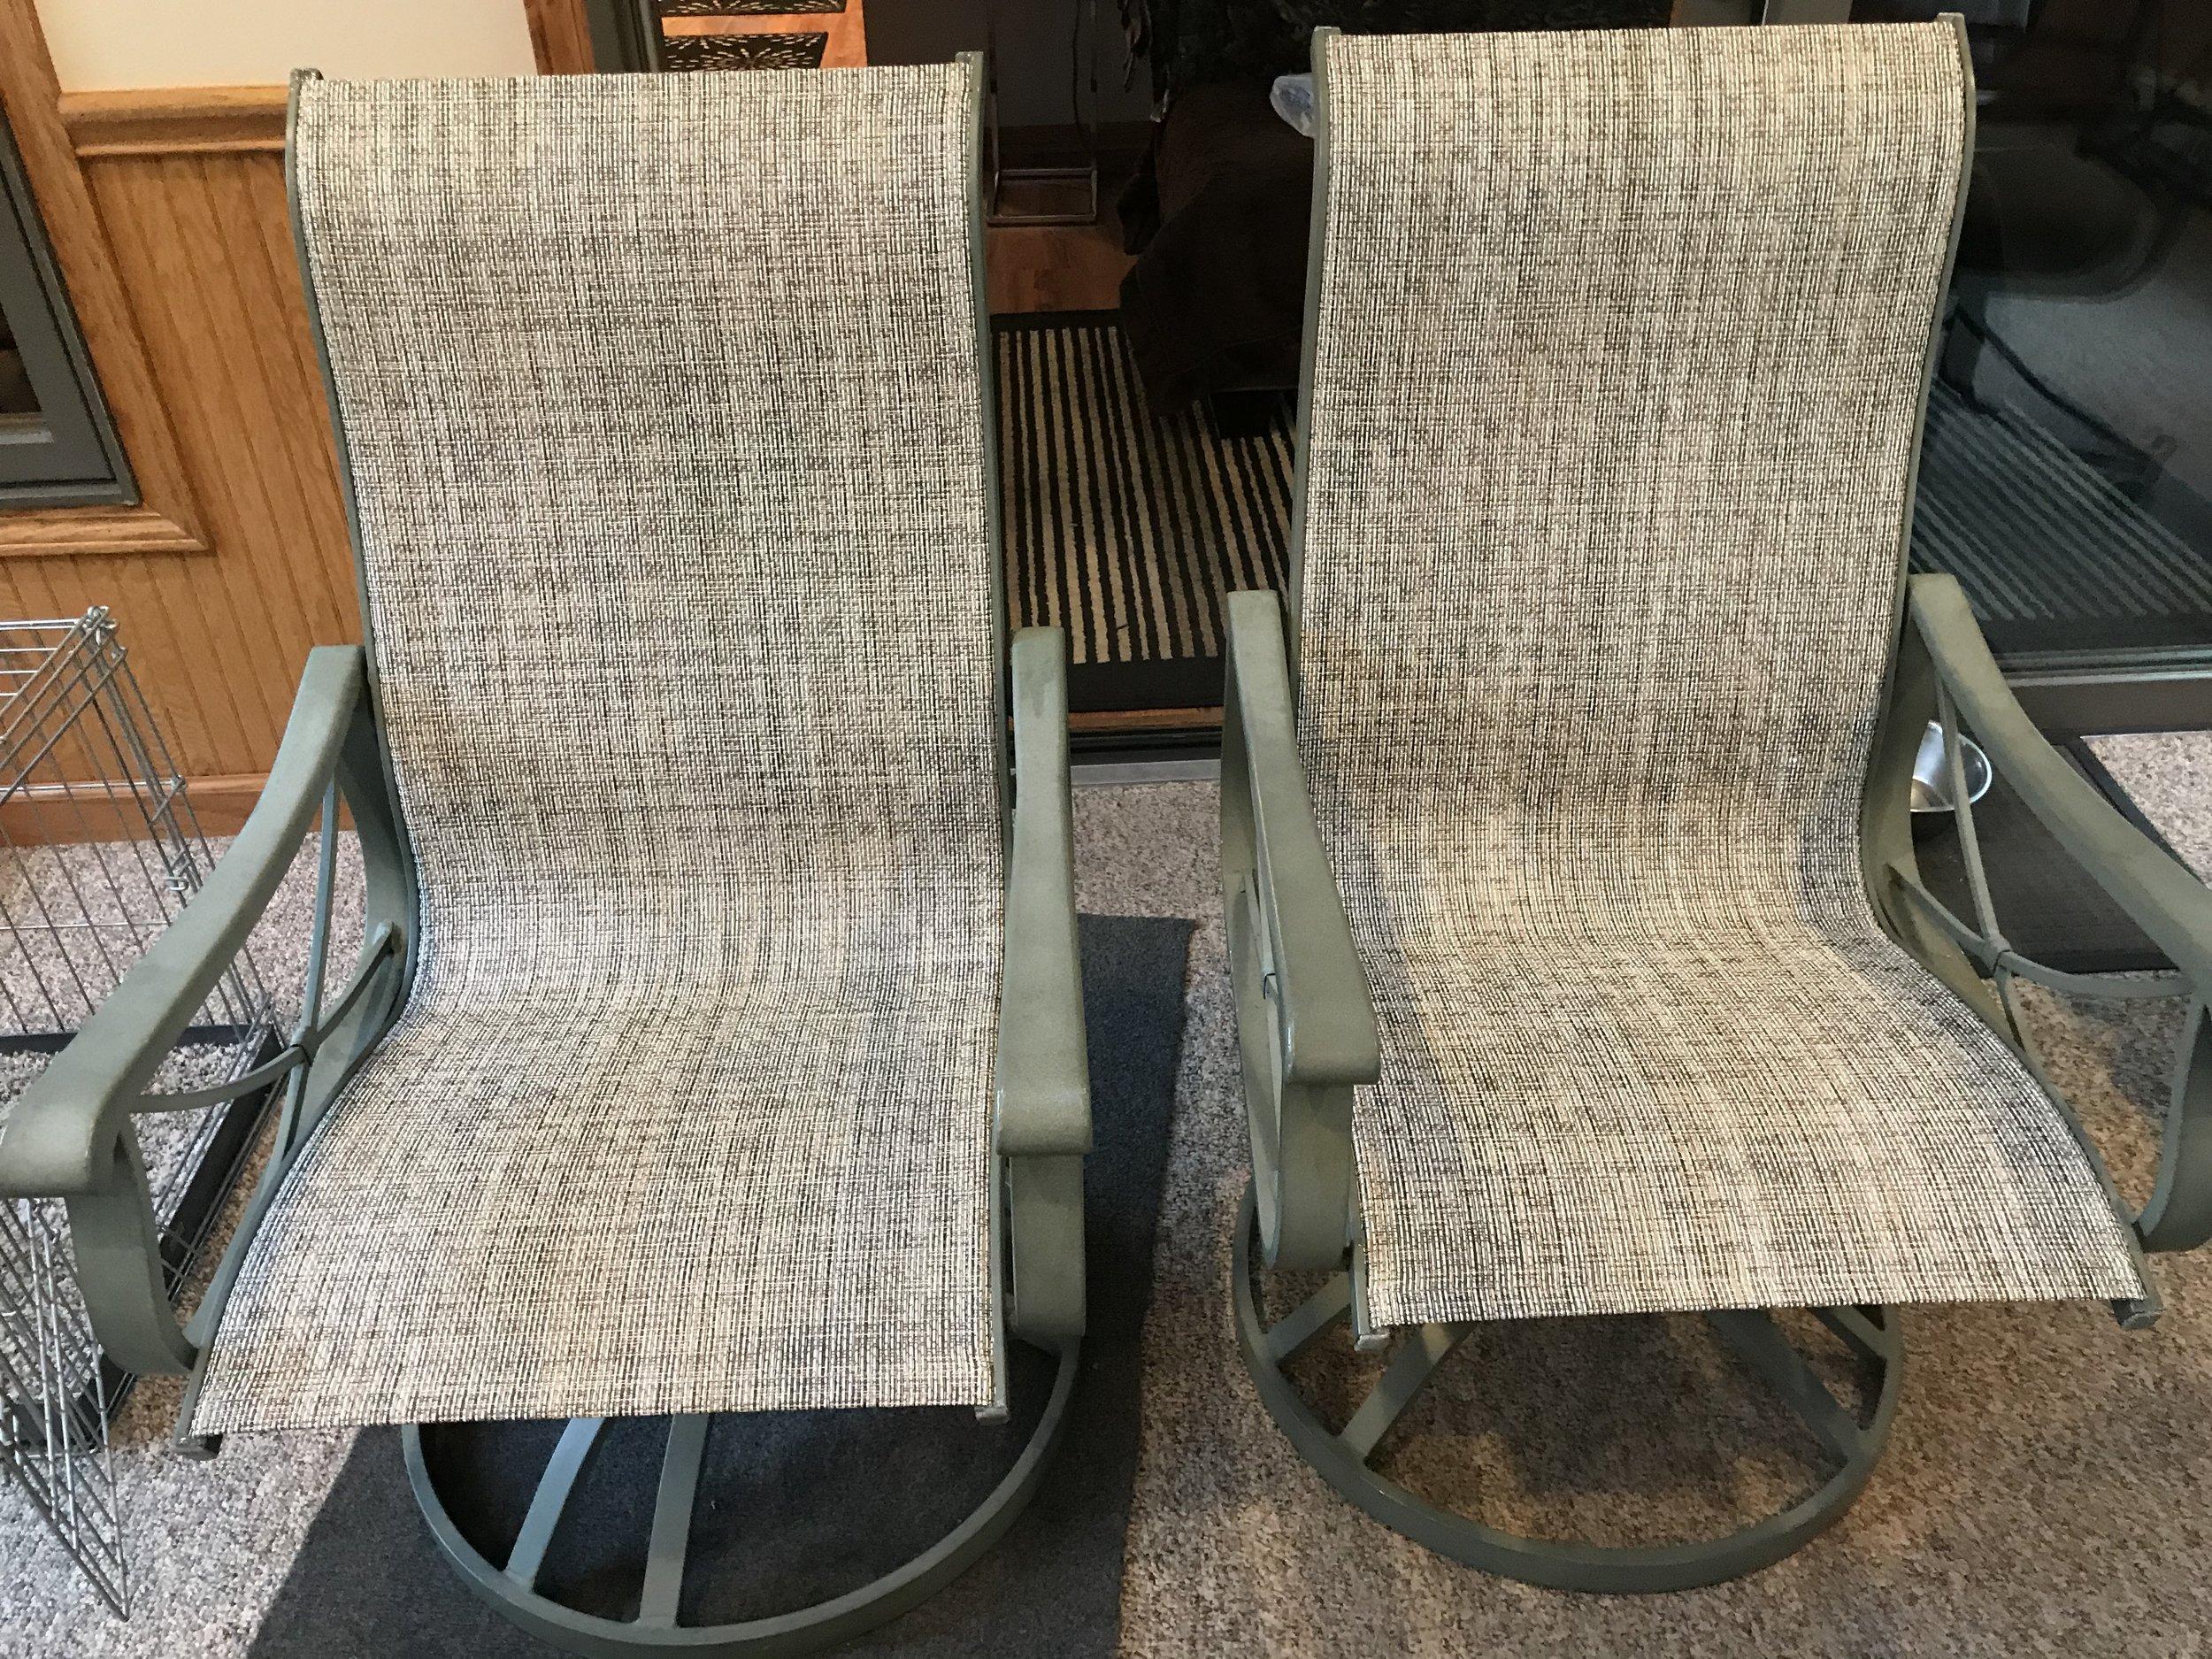 Aluminum Frame Furniture witih Natural Grasscloth Material